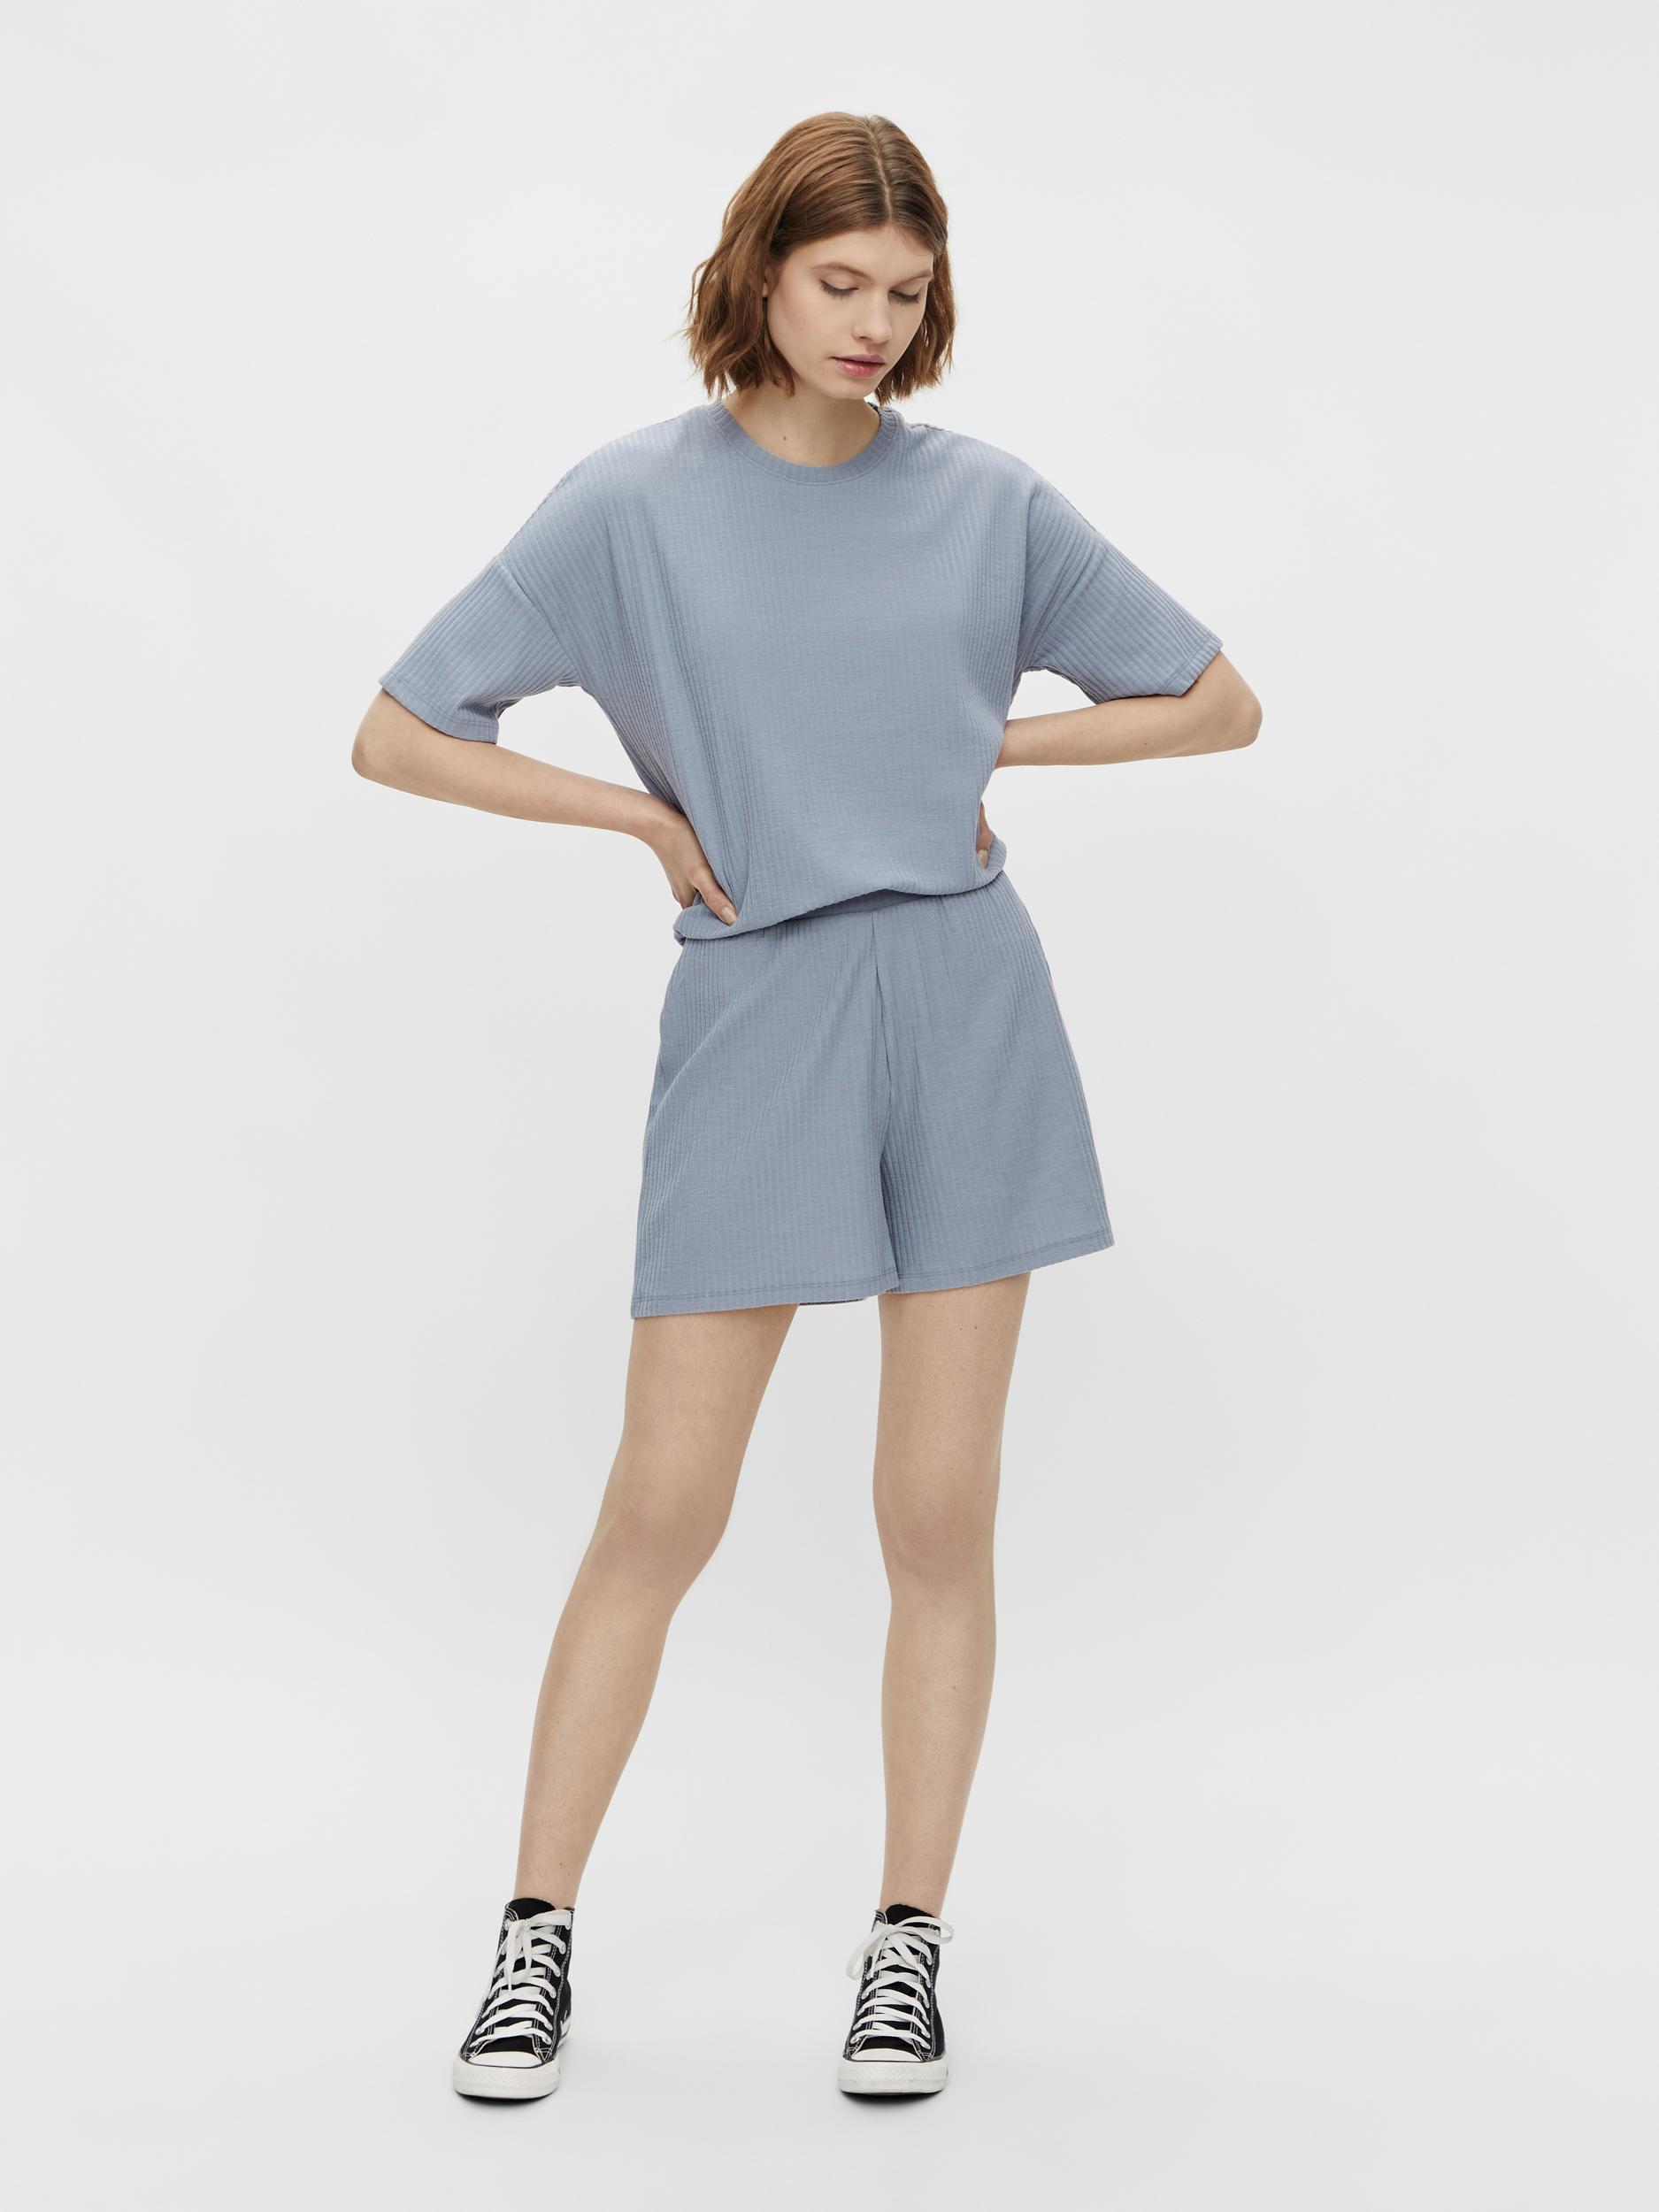 Pieces Ribbi shorts, blue fog, x-small